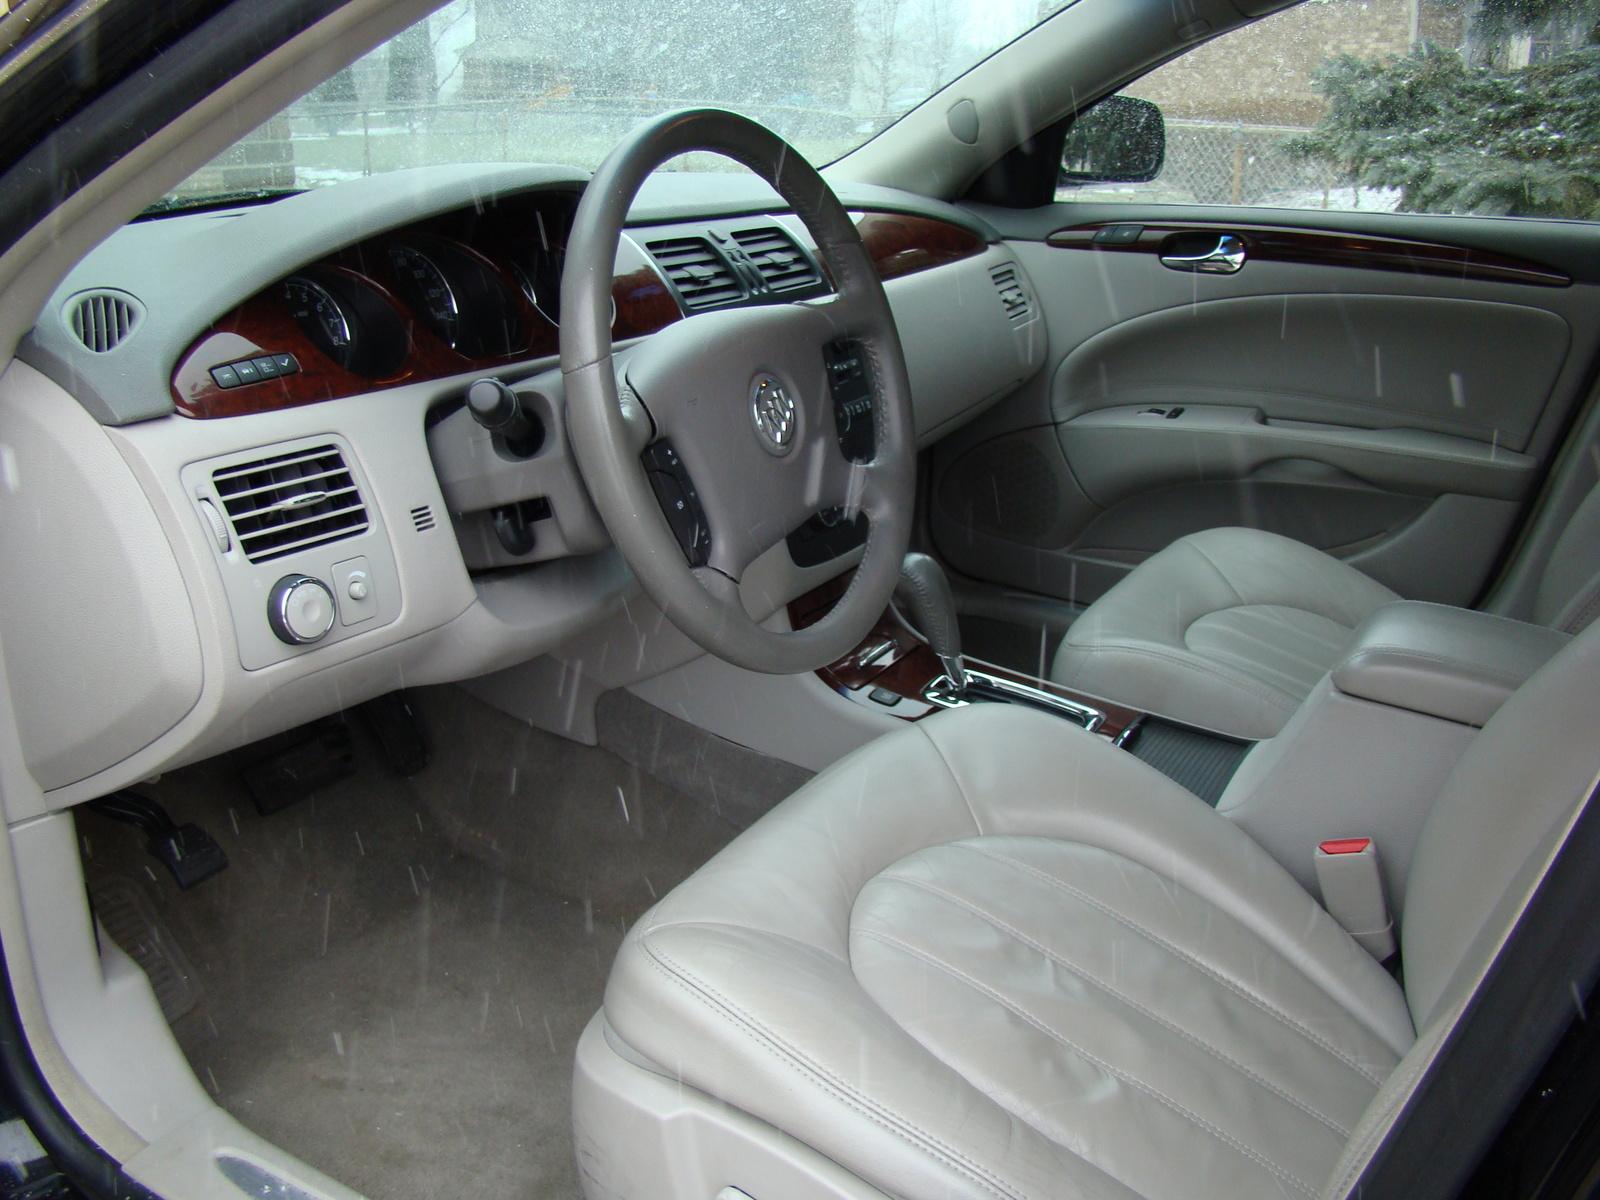 Buick lucerne interior photos